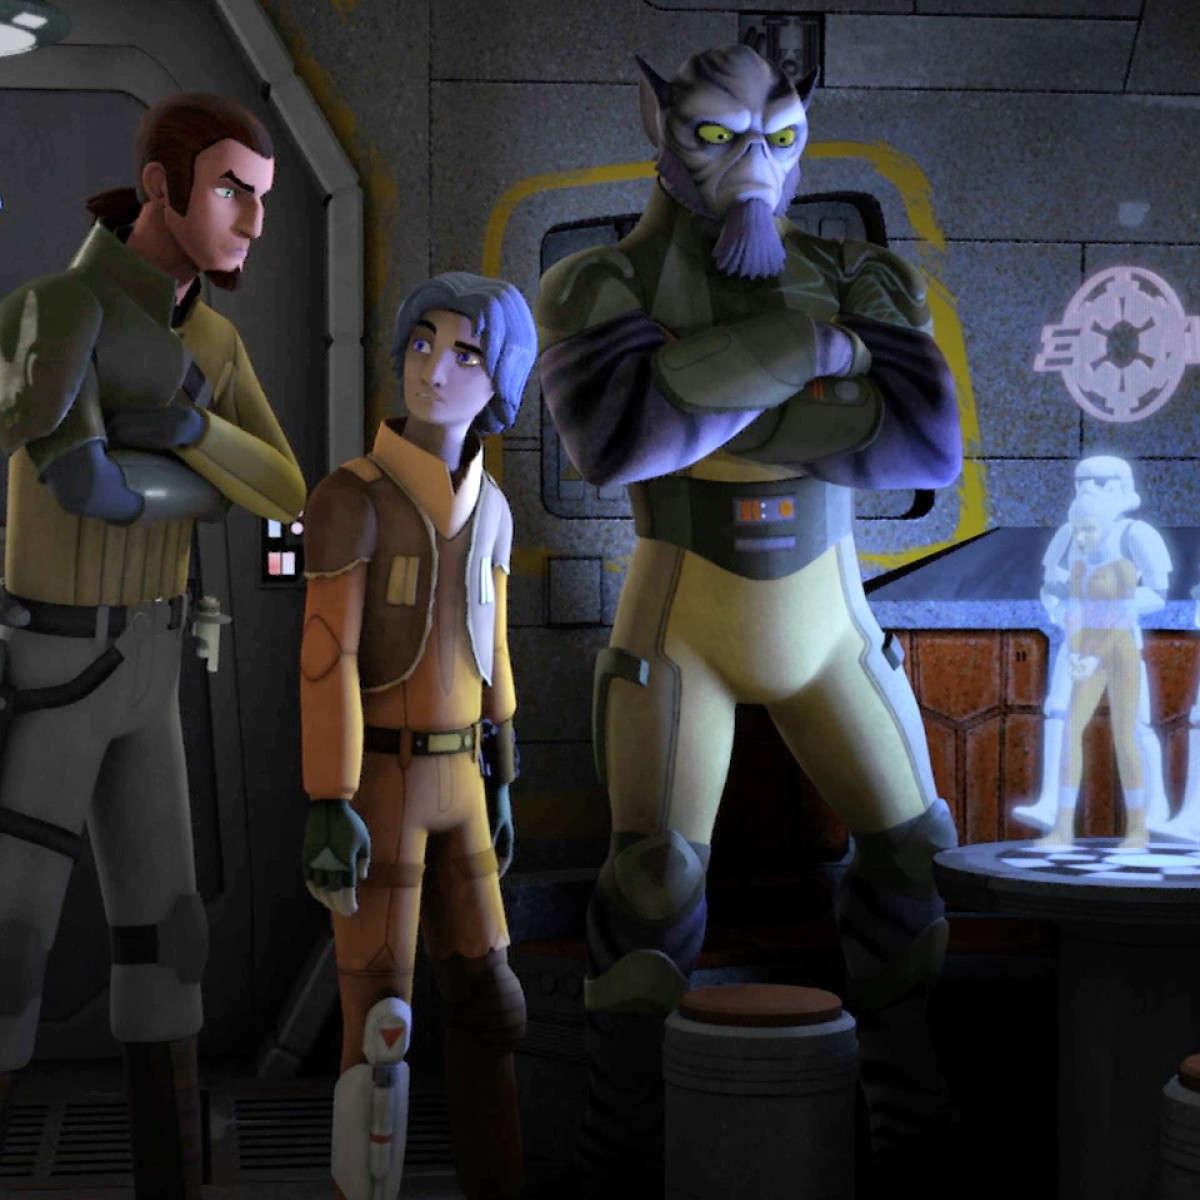 star-wars-rebels-crew-2400x1200-382692499971.jpg